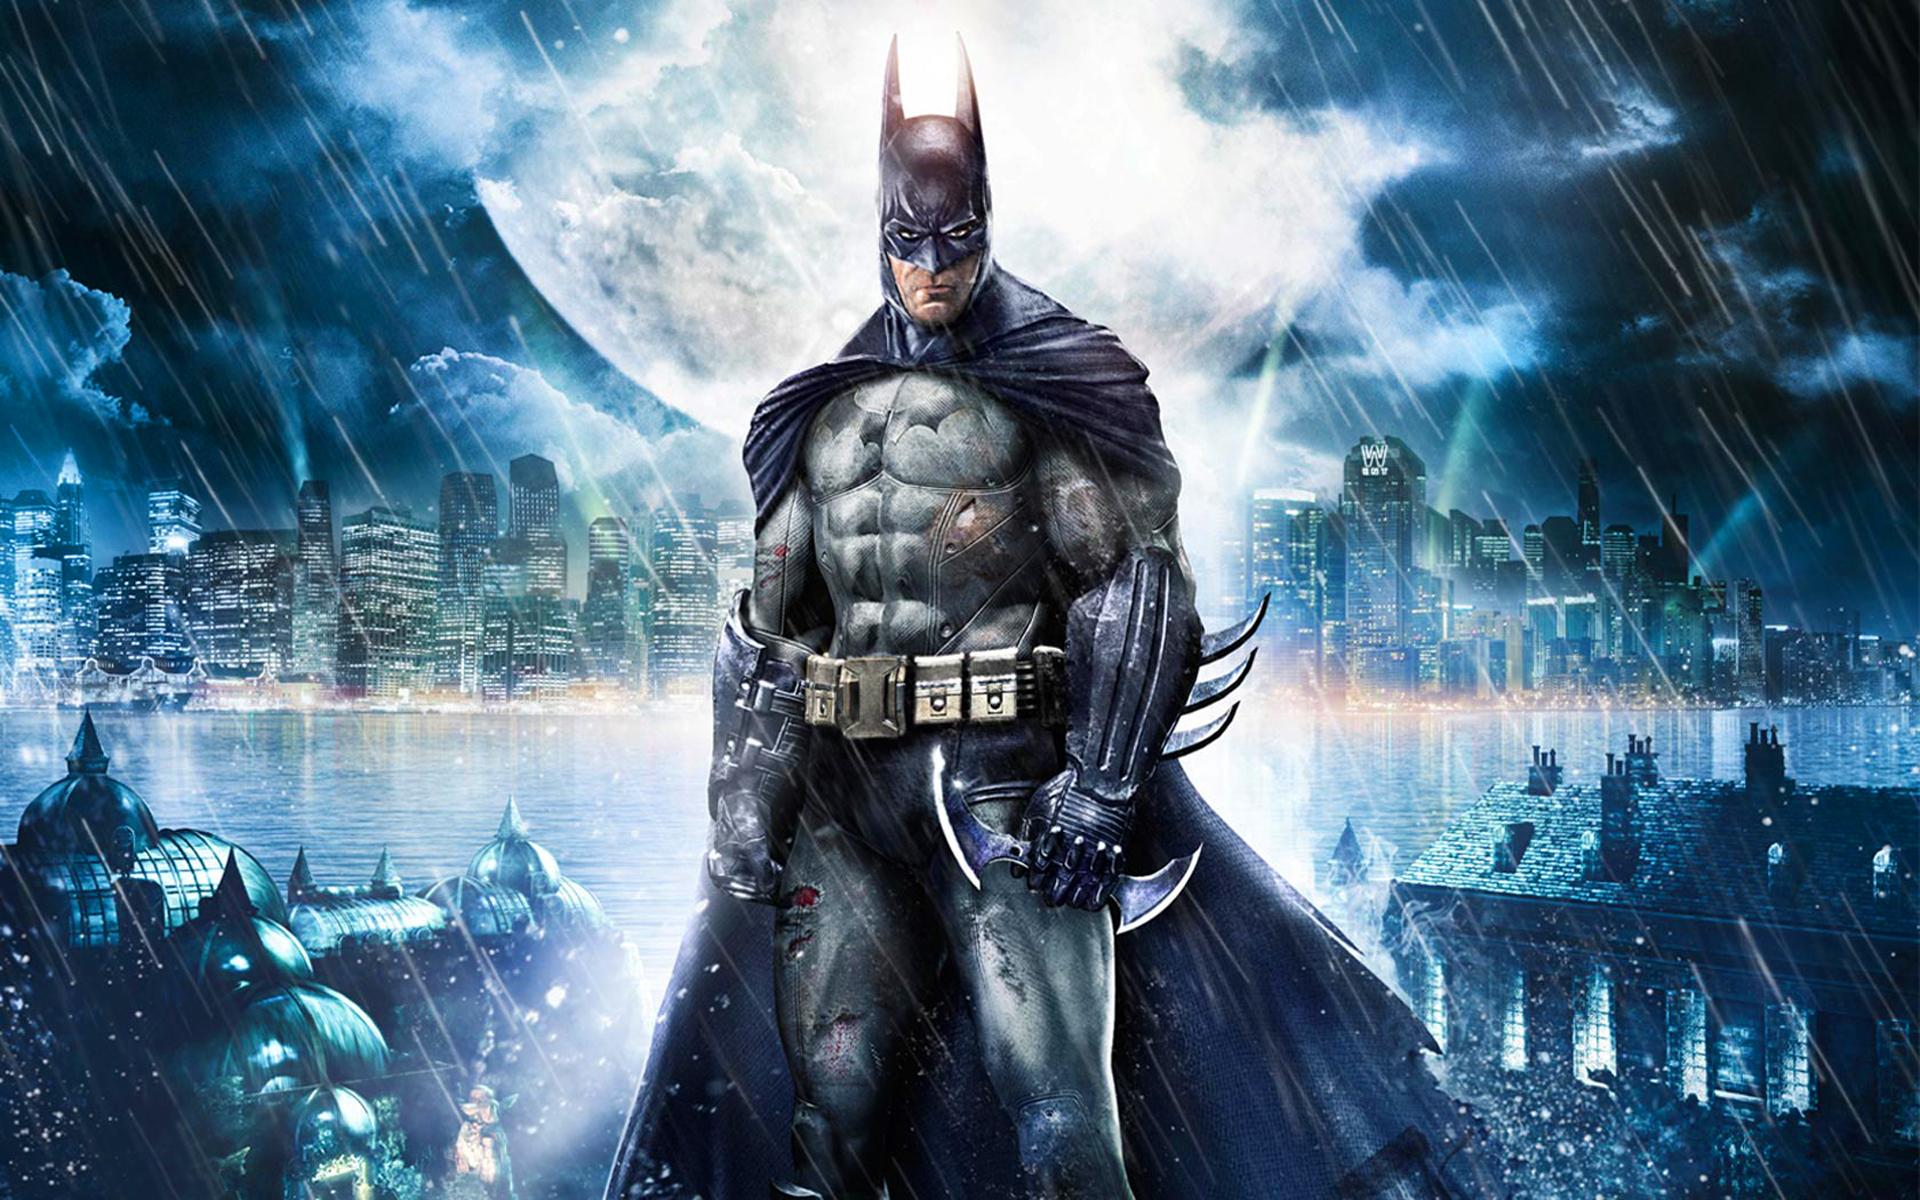 Batman Arkham Asylum Full Hd Wallpaper 1080p 17410 Hd Wallpapers 1920x1200